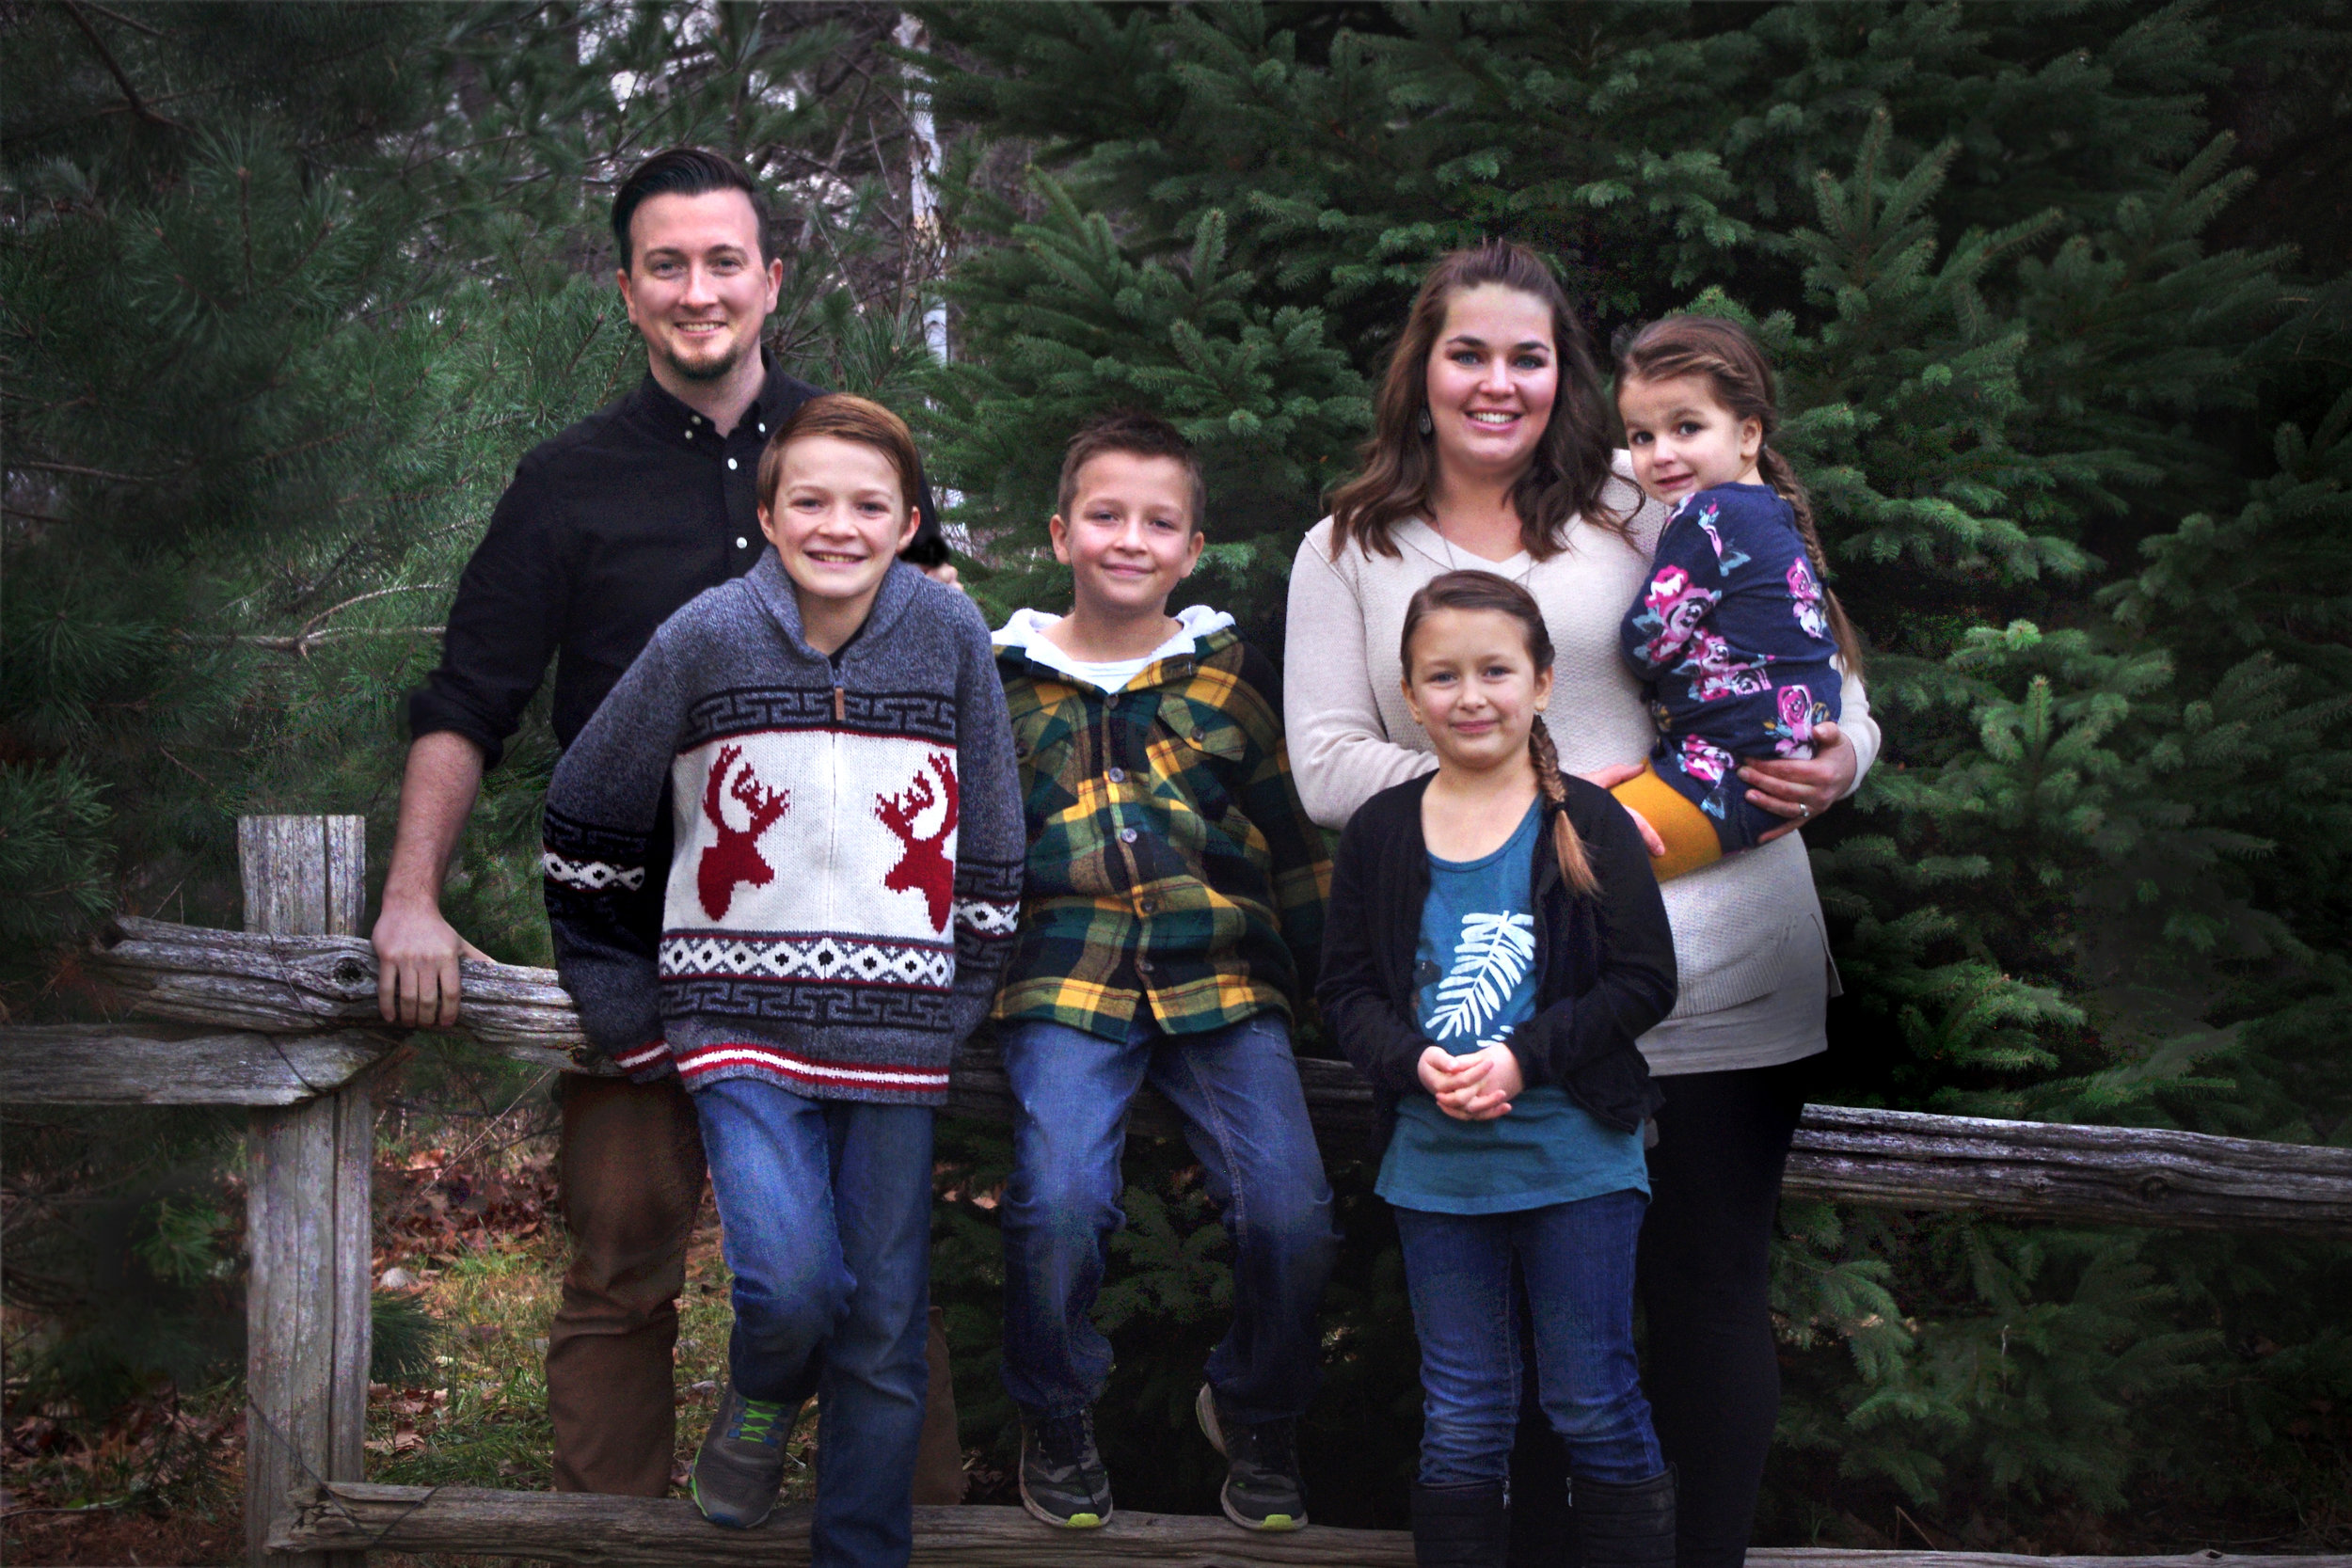 The Symonds family.